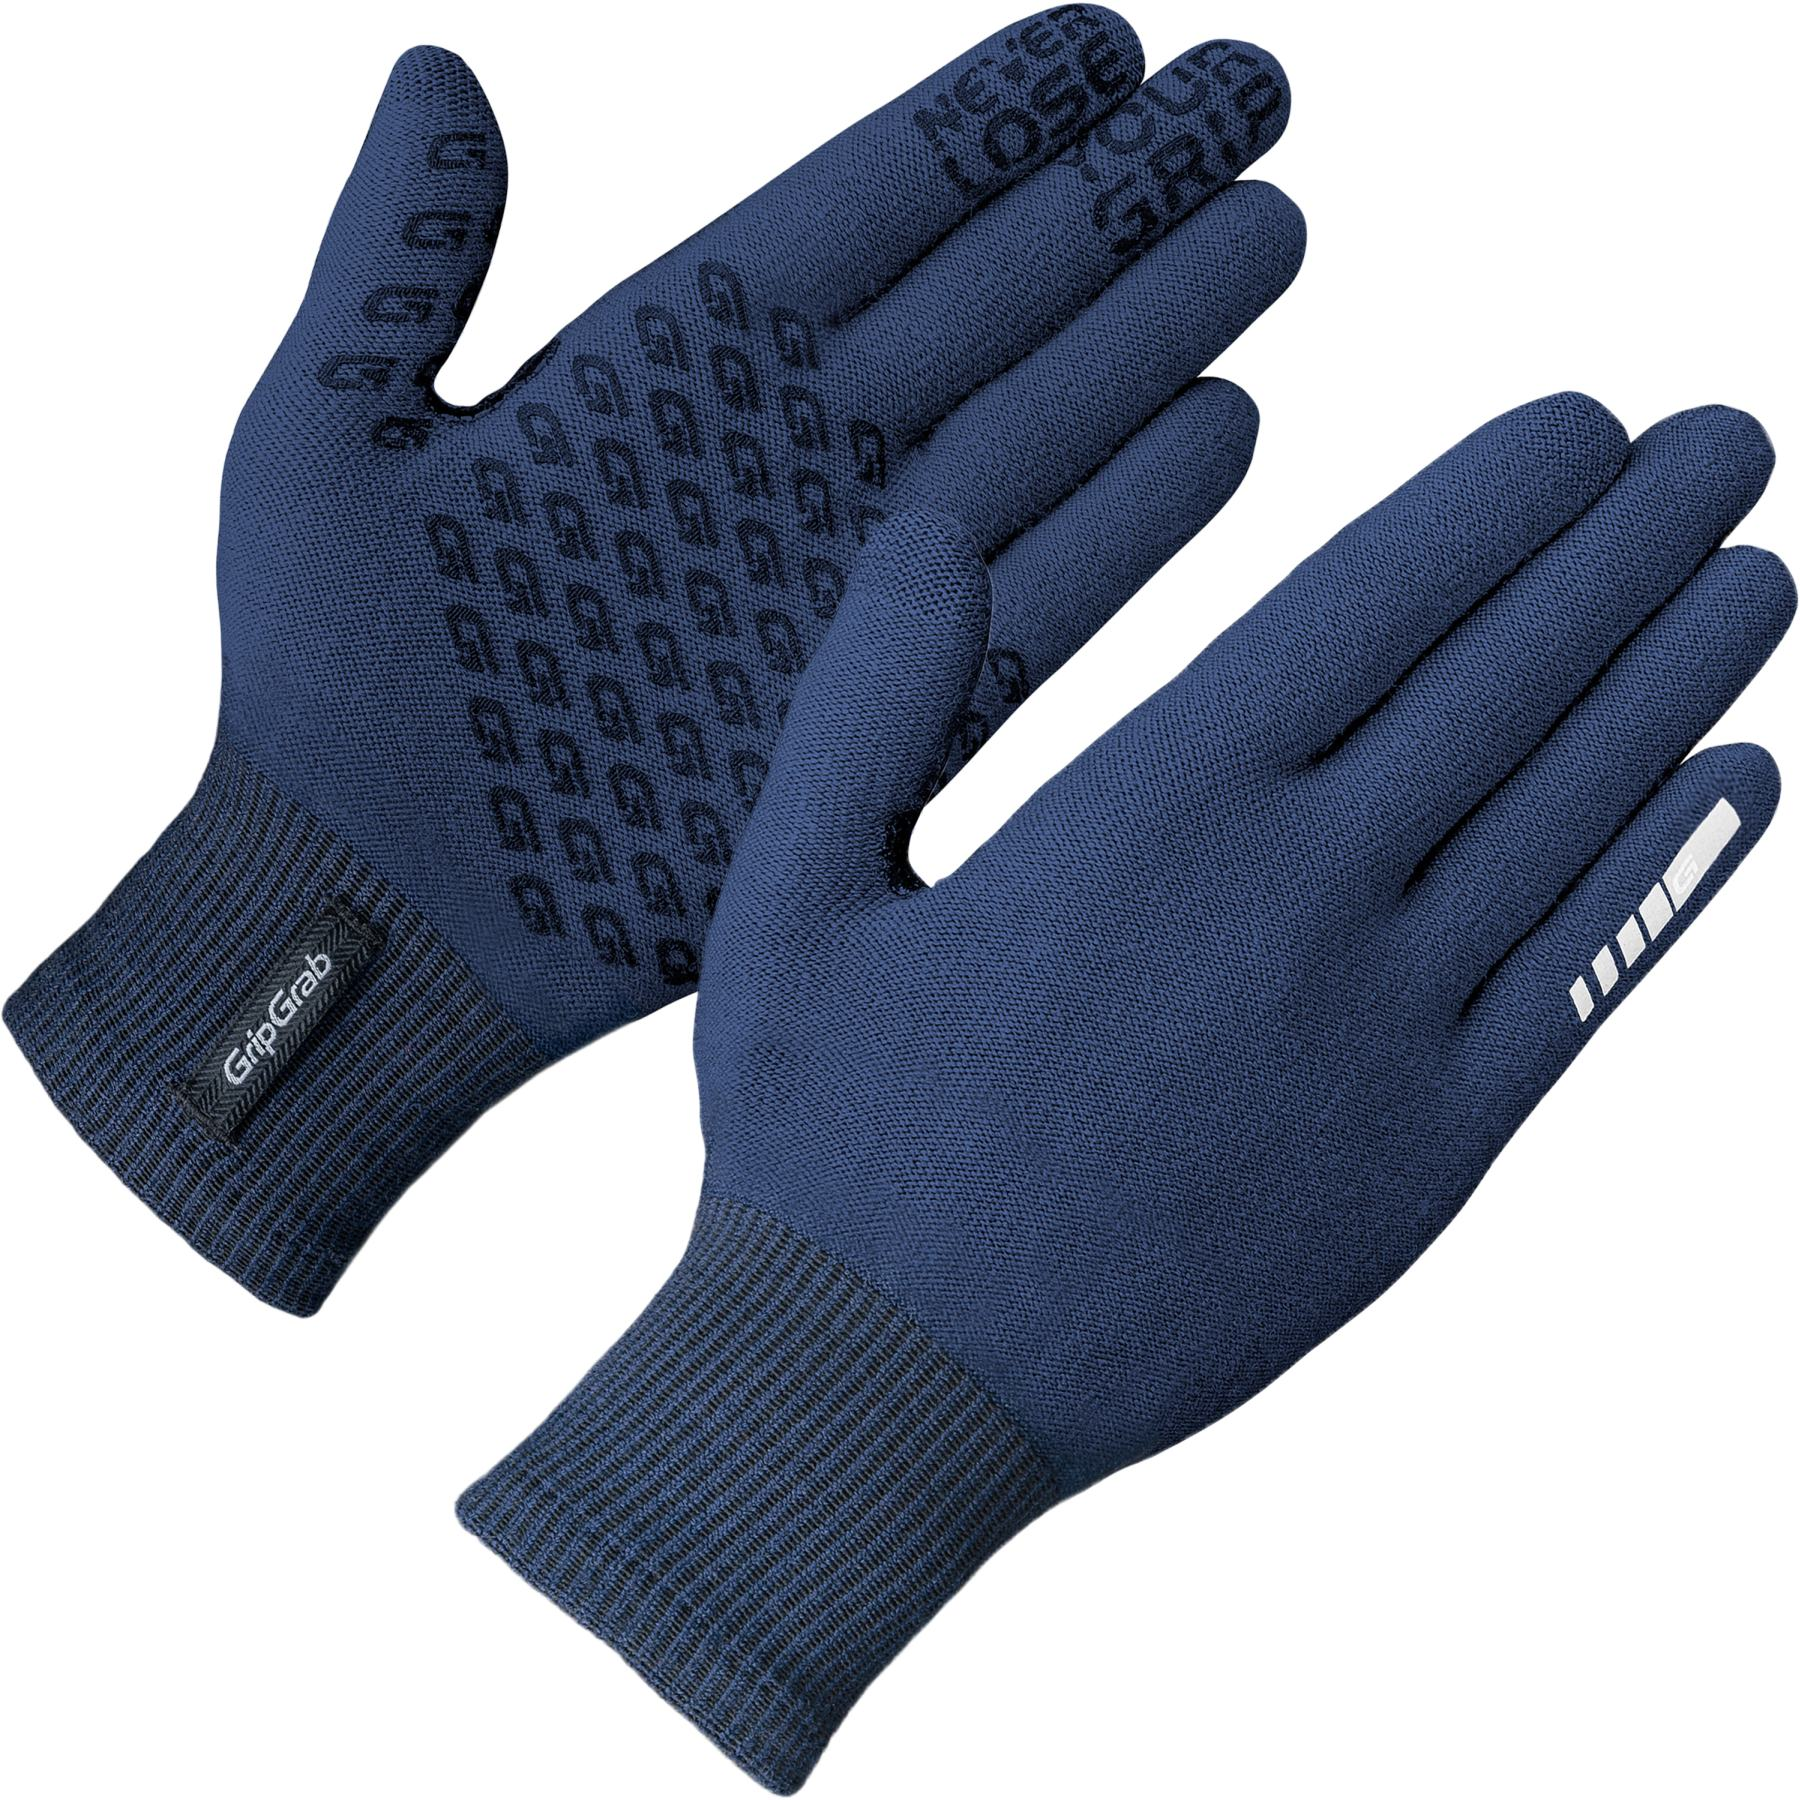 GripGrab Primavera Merino Midseason Glove II - Navy Blue